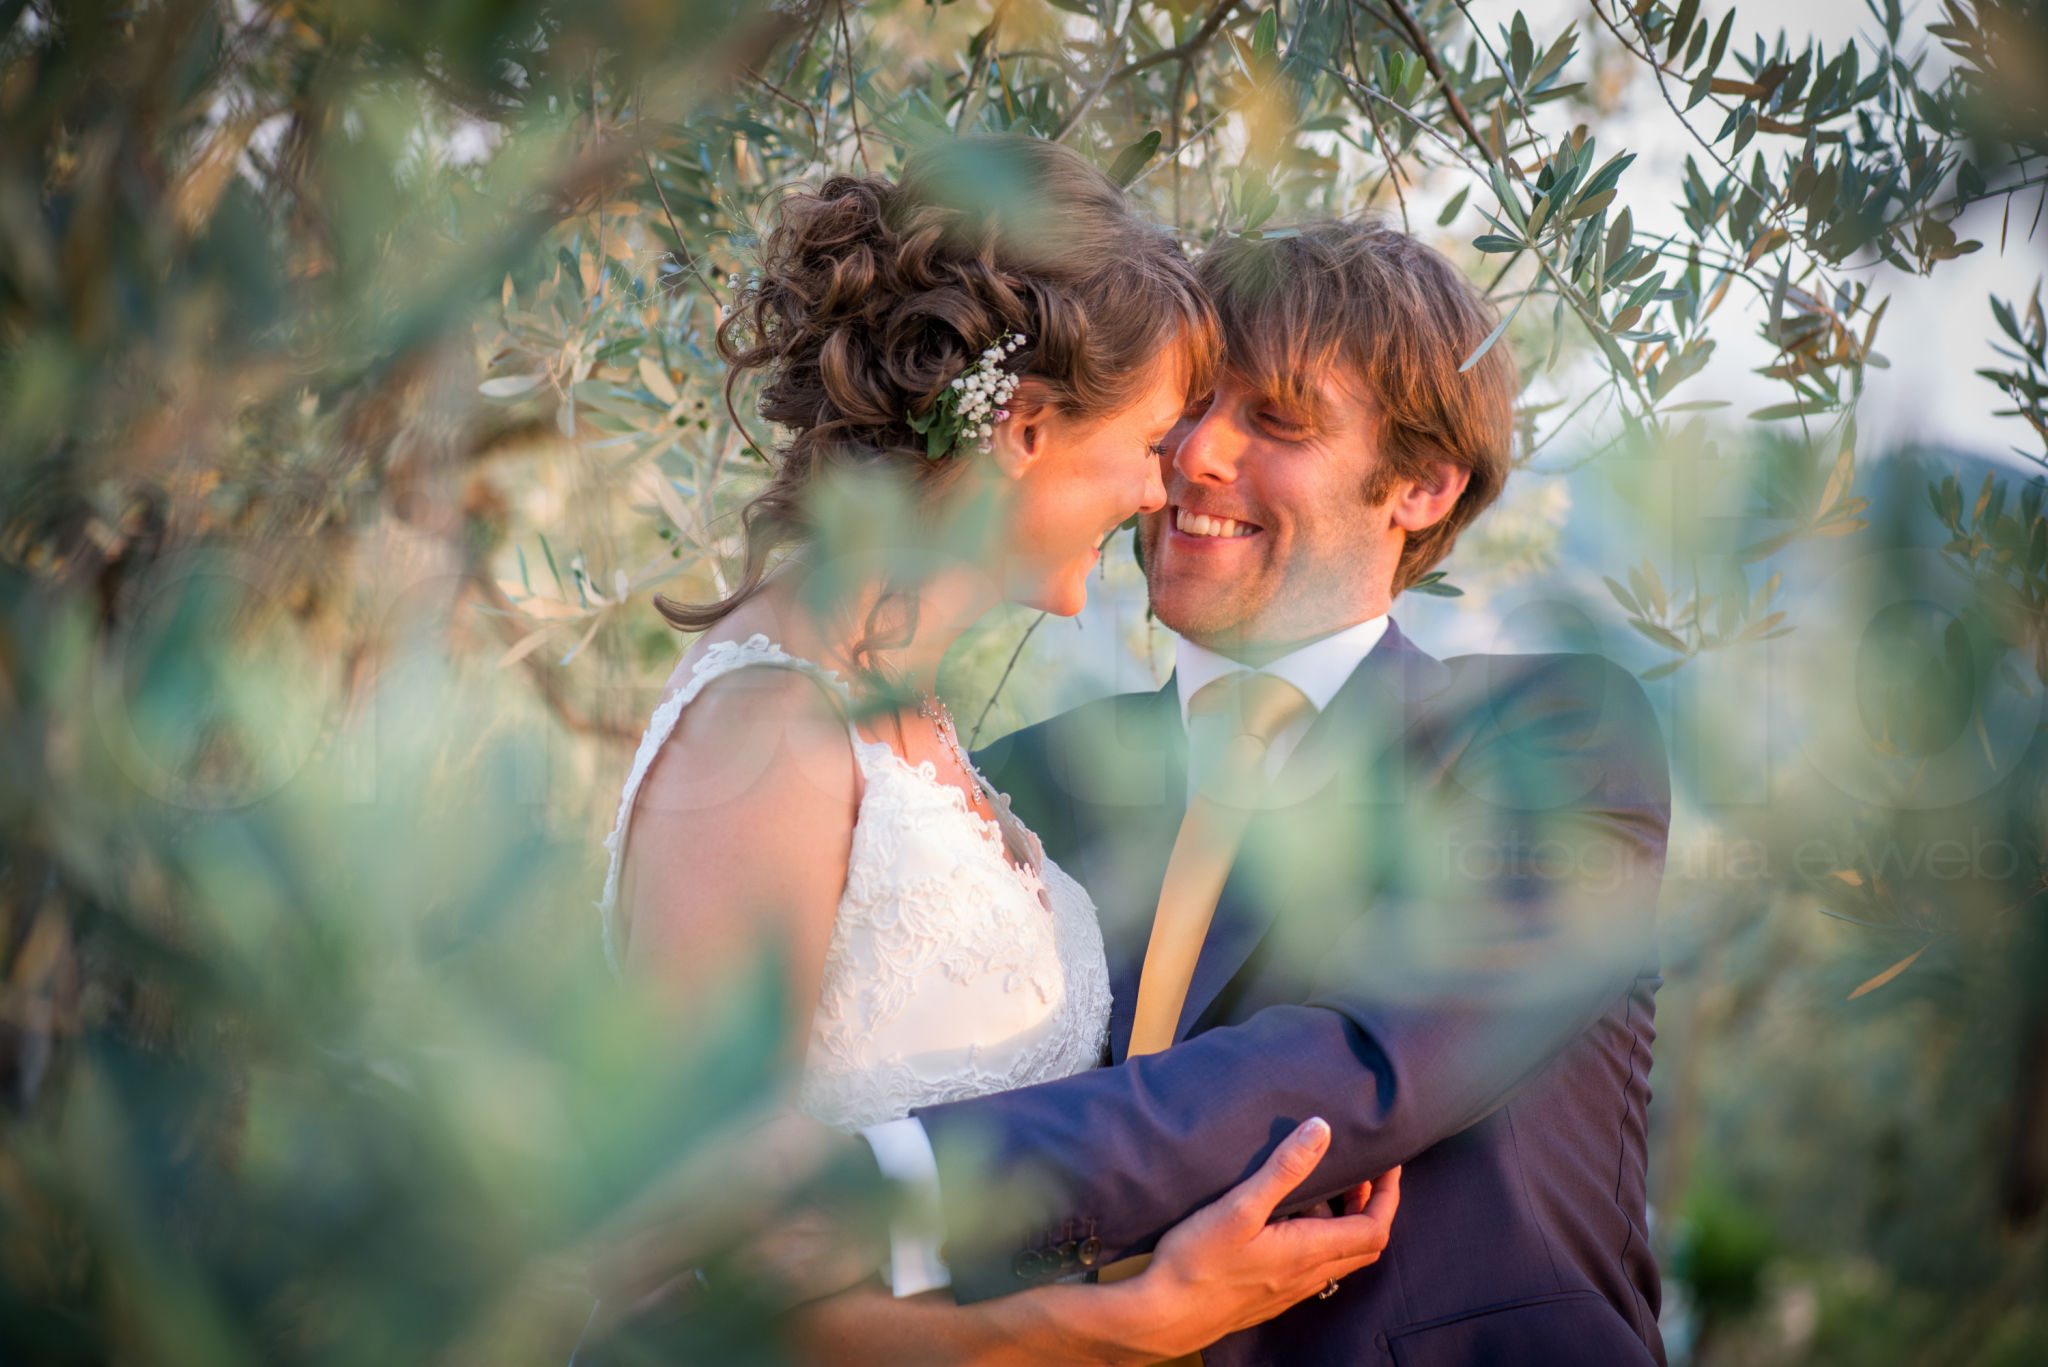 https://lnx.mirkone.it/wp-content/uploads/2015/07/fotografo-matrimoni-faenza-0027.jpg